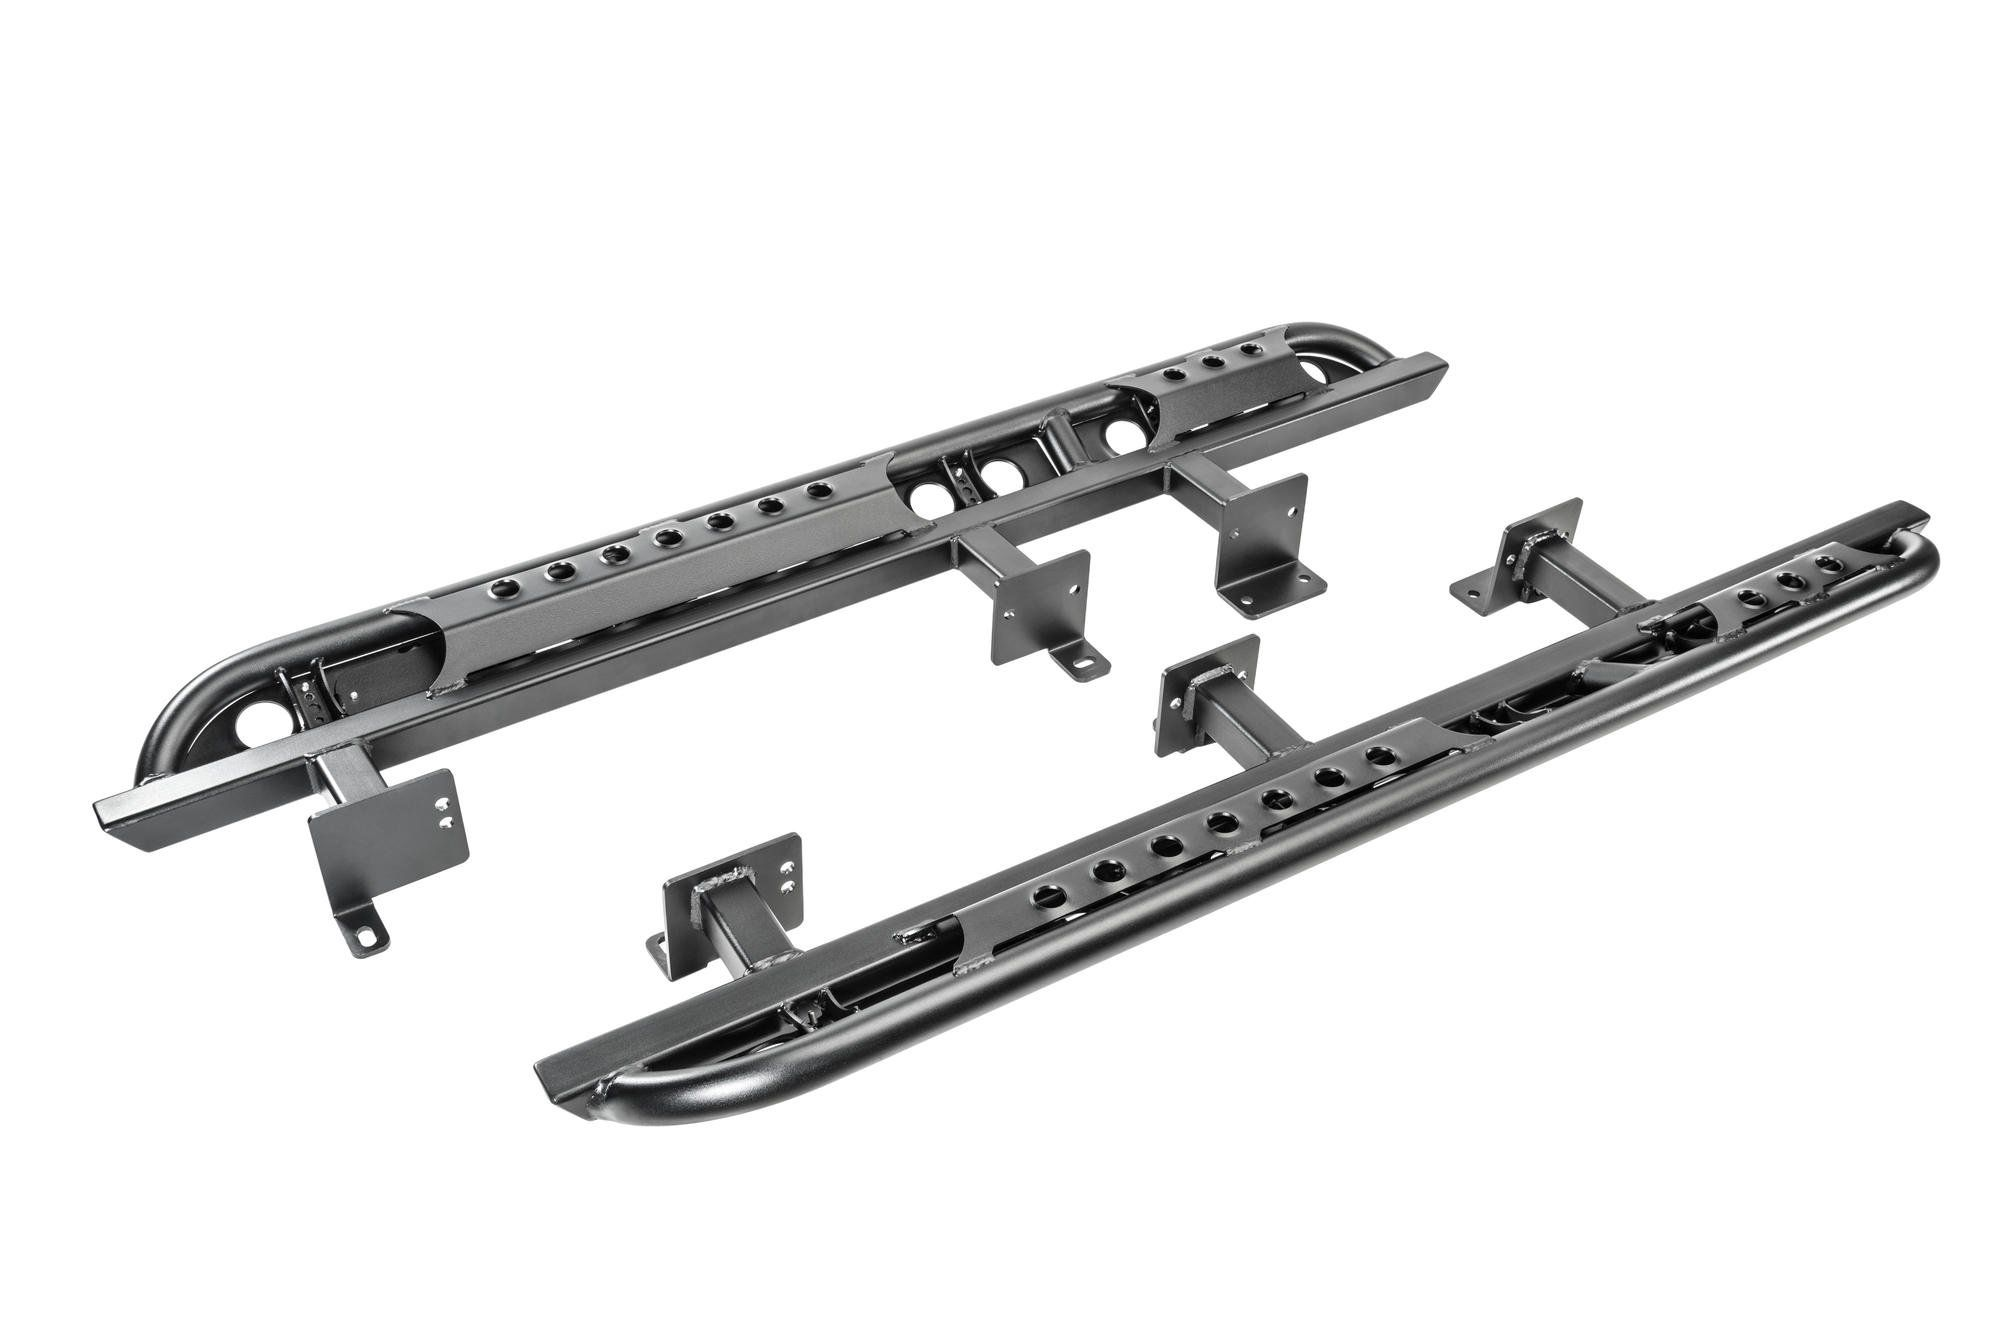 Lod Signature Series Rock Sliders For 07 18 Jeep Wrangler